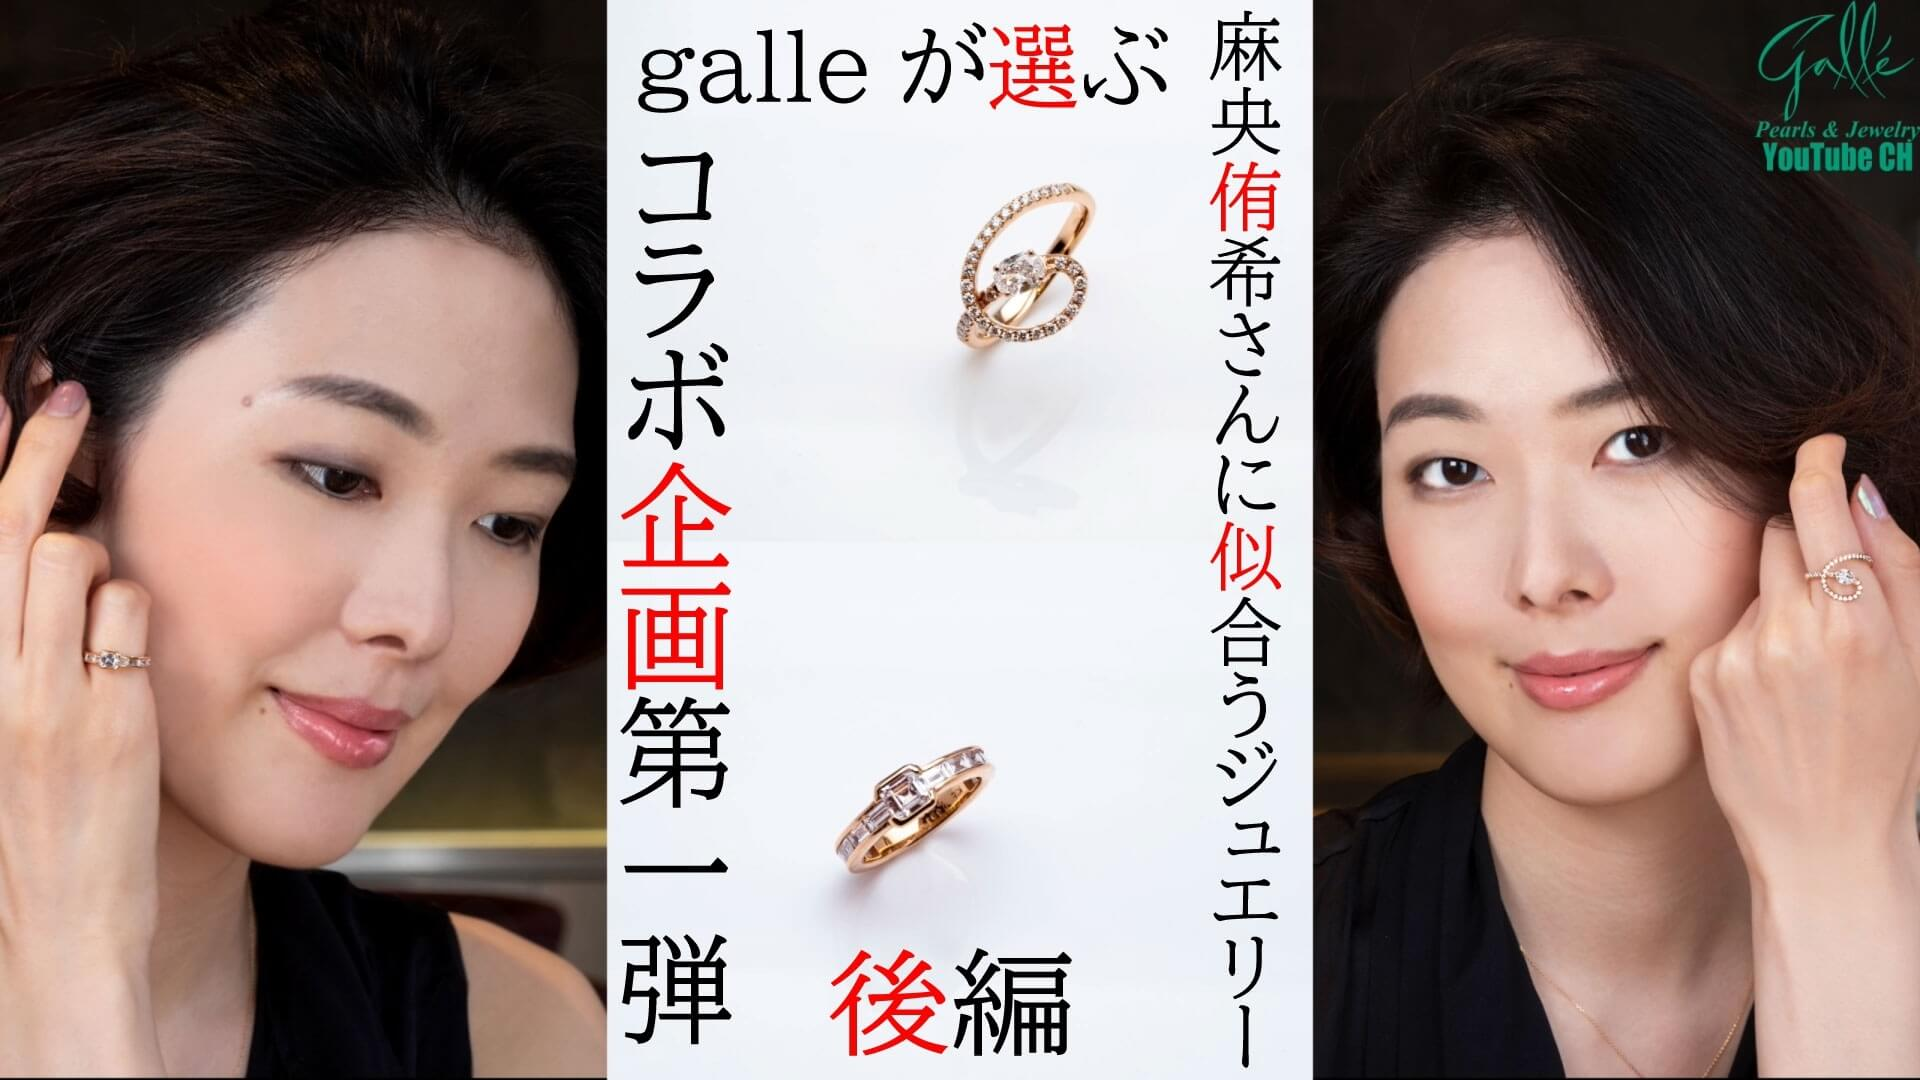 Galle × 麻央 侑希コラボ企画第一弾後編のサムネイル